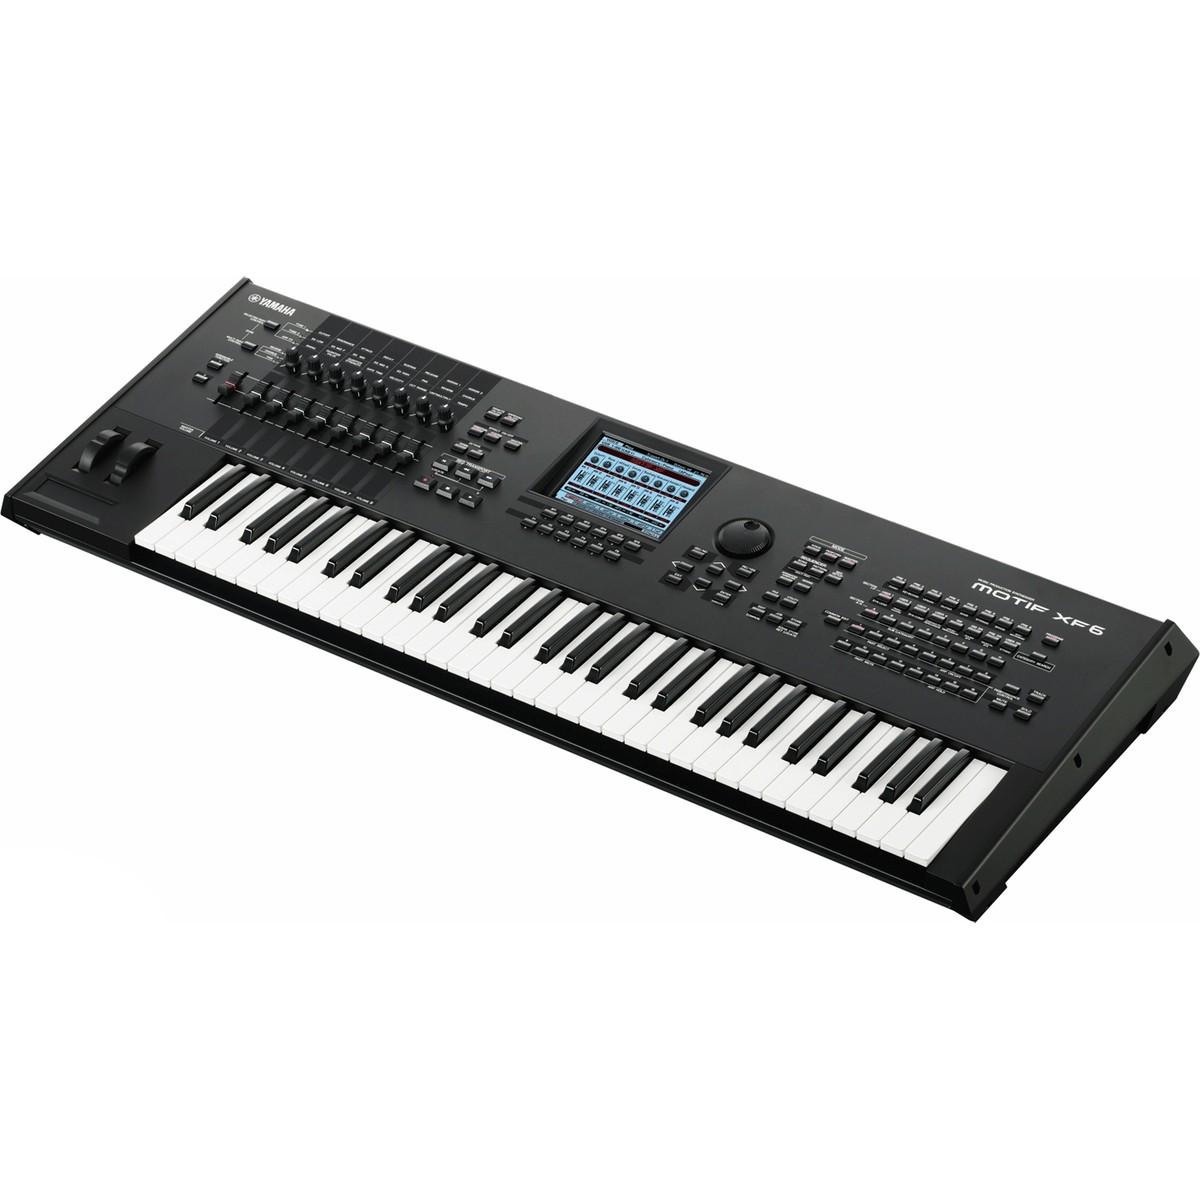 Daw Keyboard Workstation : yamaha motif xf6 keyboard workstation b stock at ~ Russianpoet.info Haus und Dekorationen